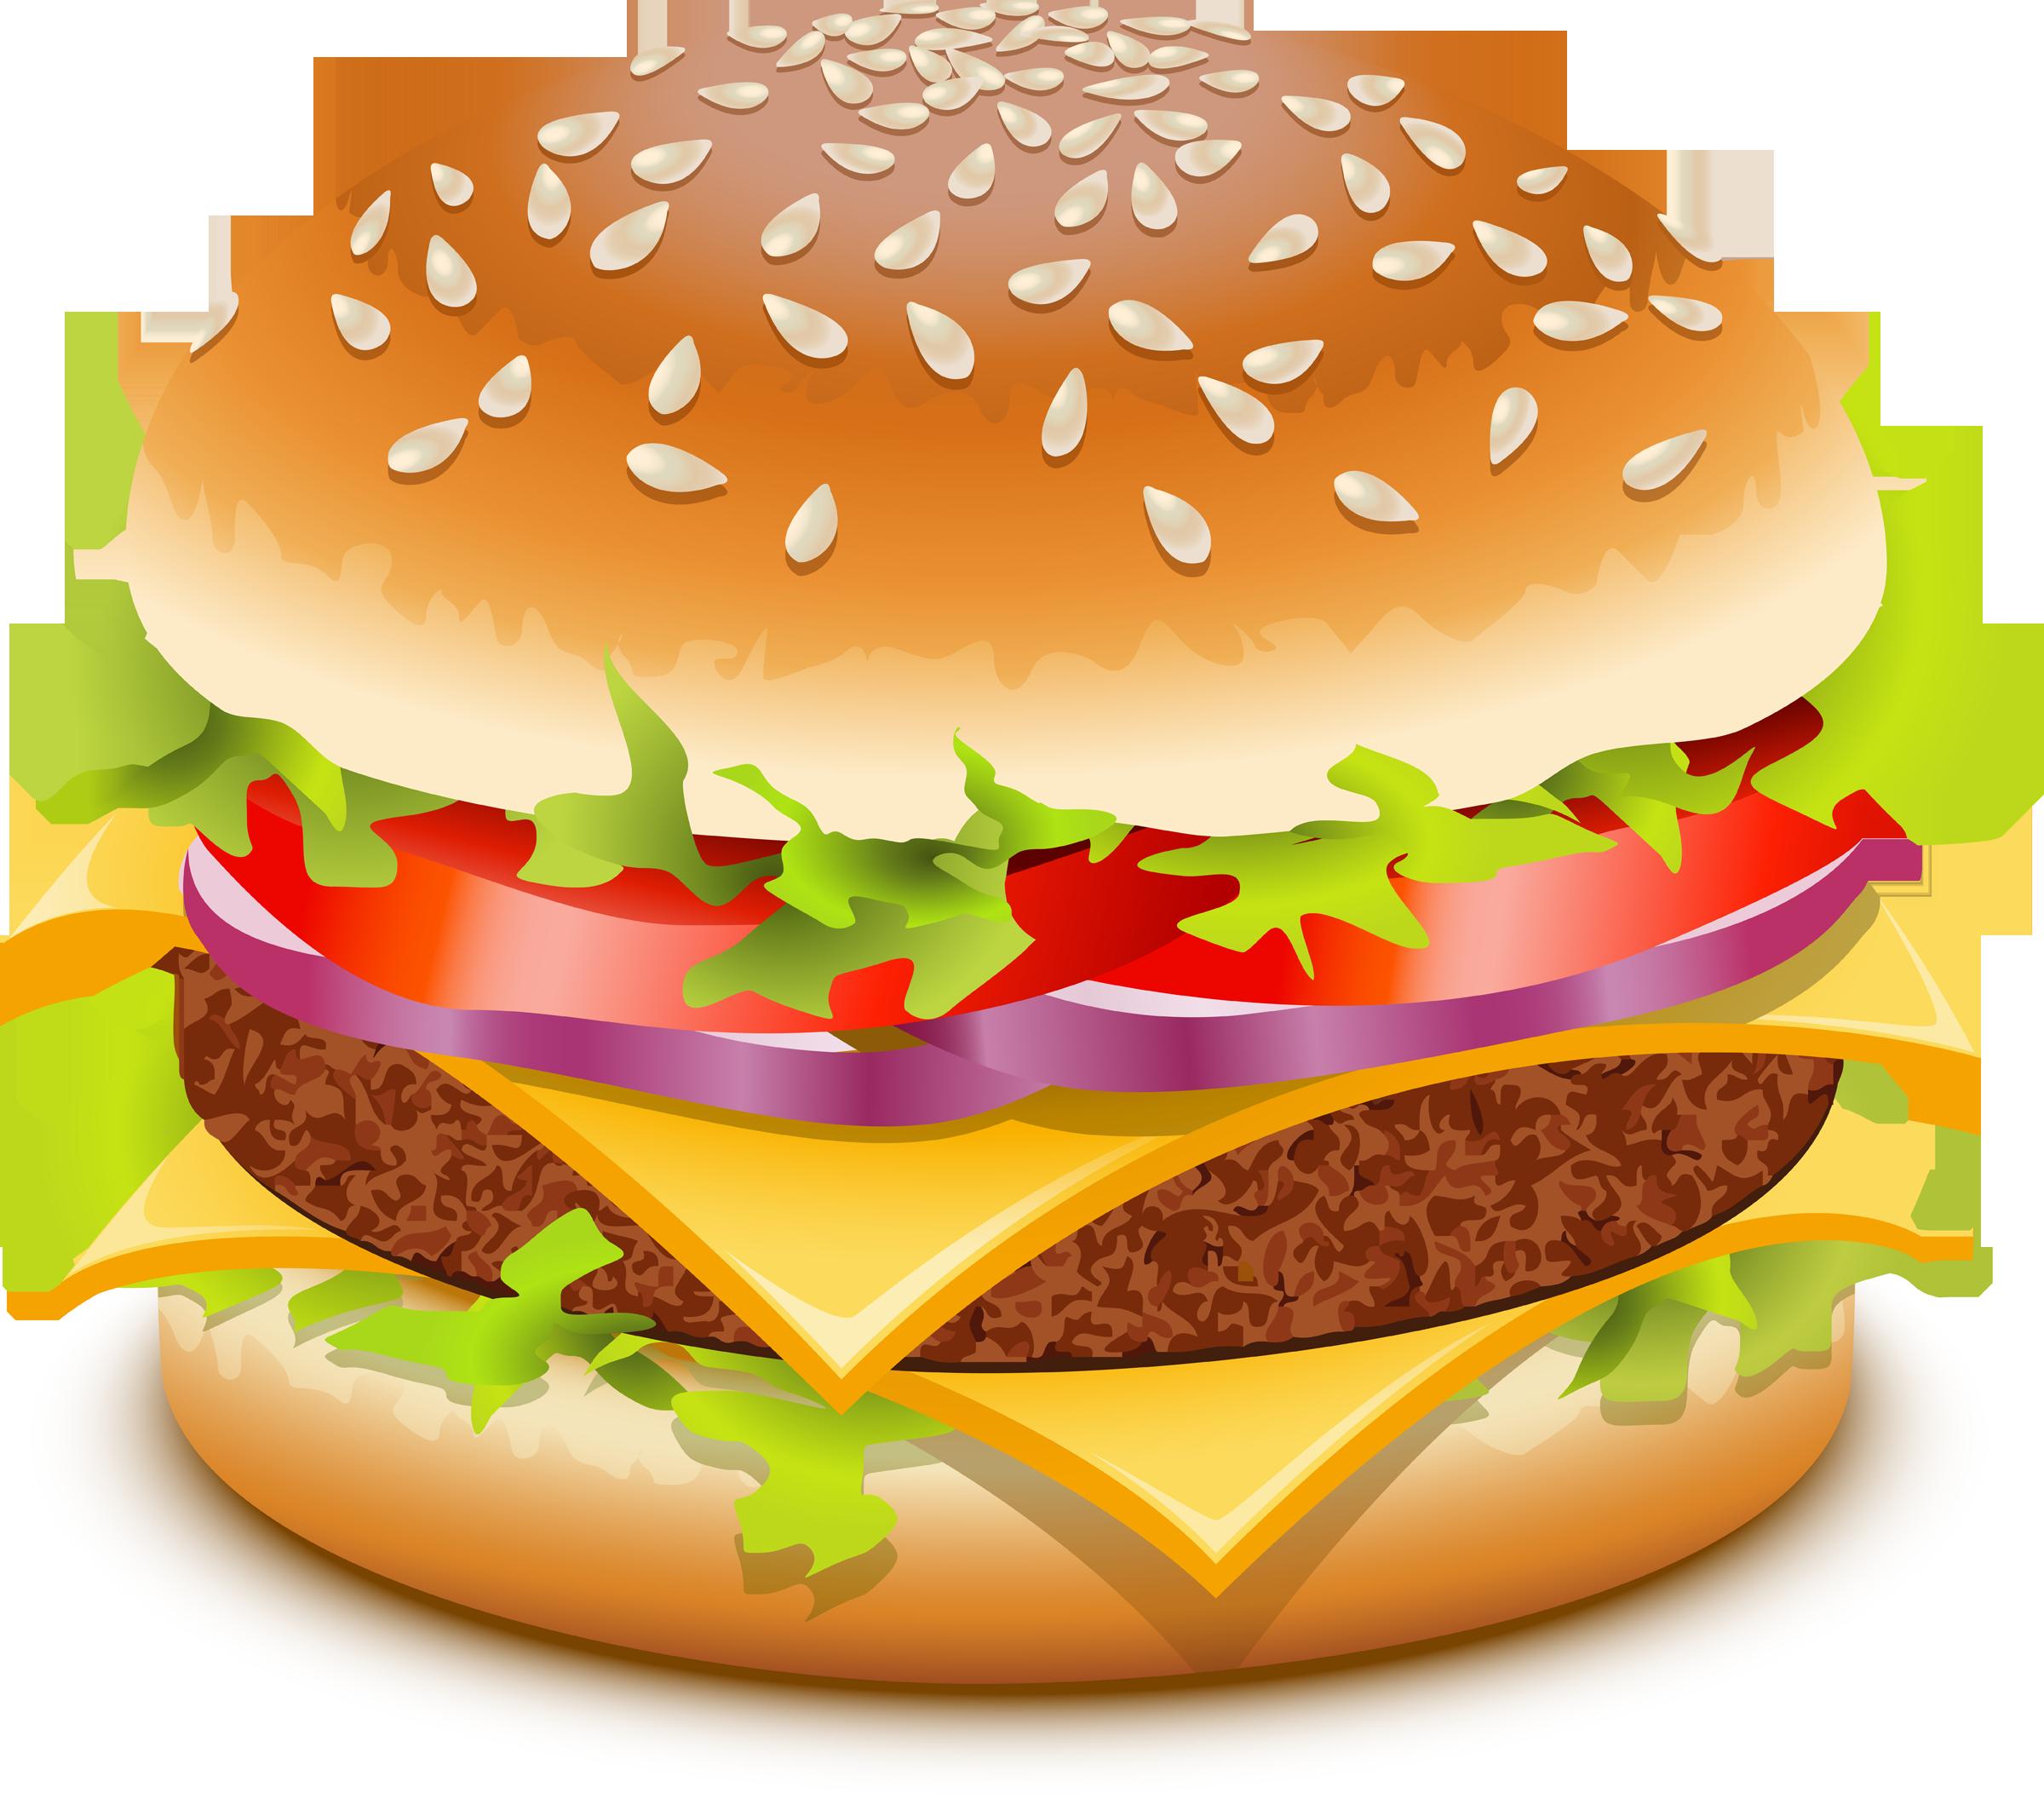 Free Burgers Cliparts, Download Free Clip Art, Free Clip Art.